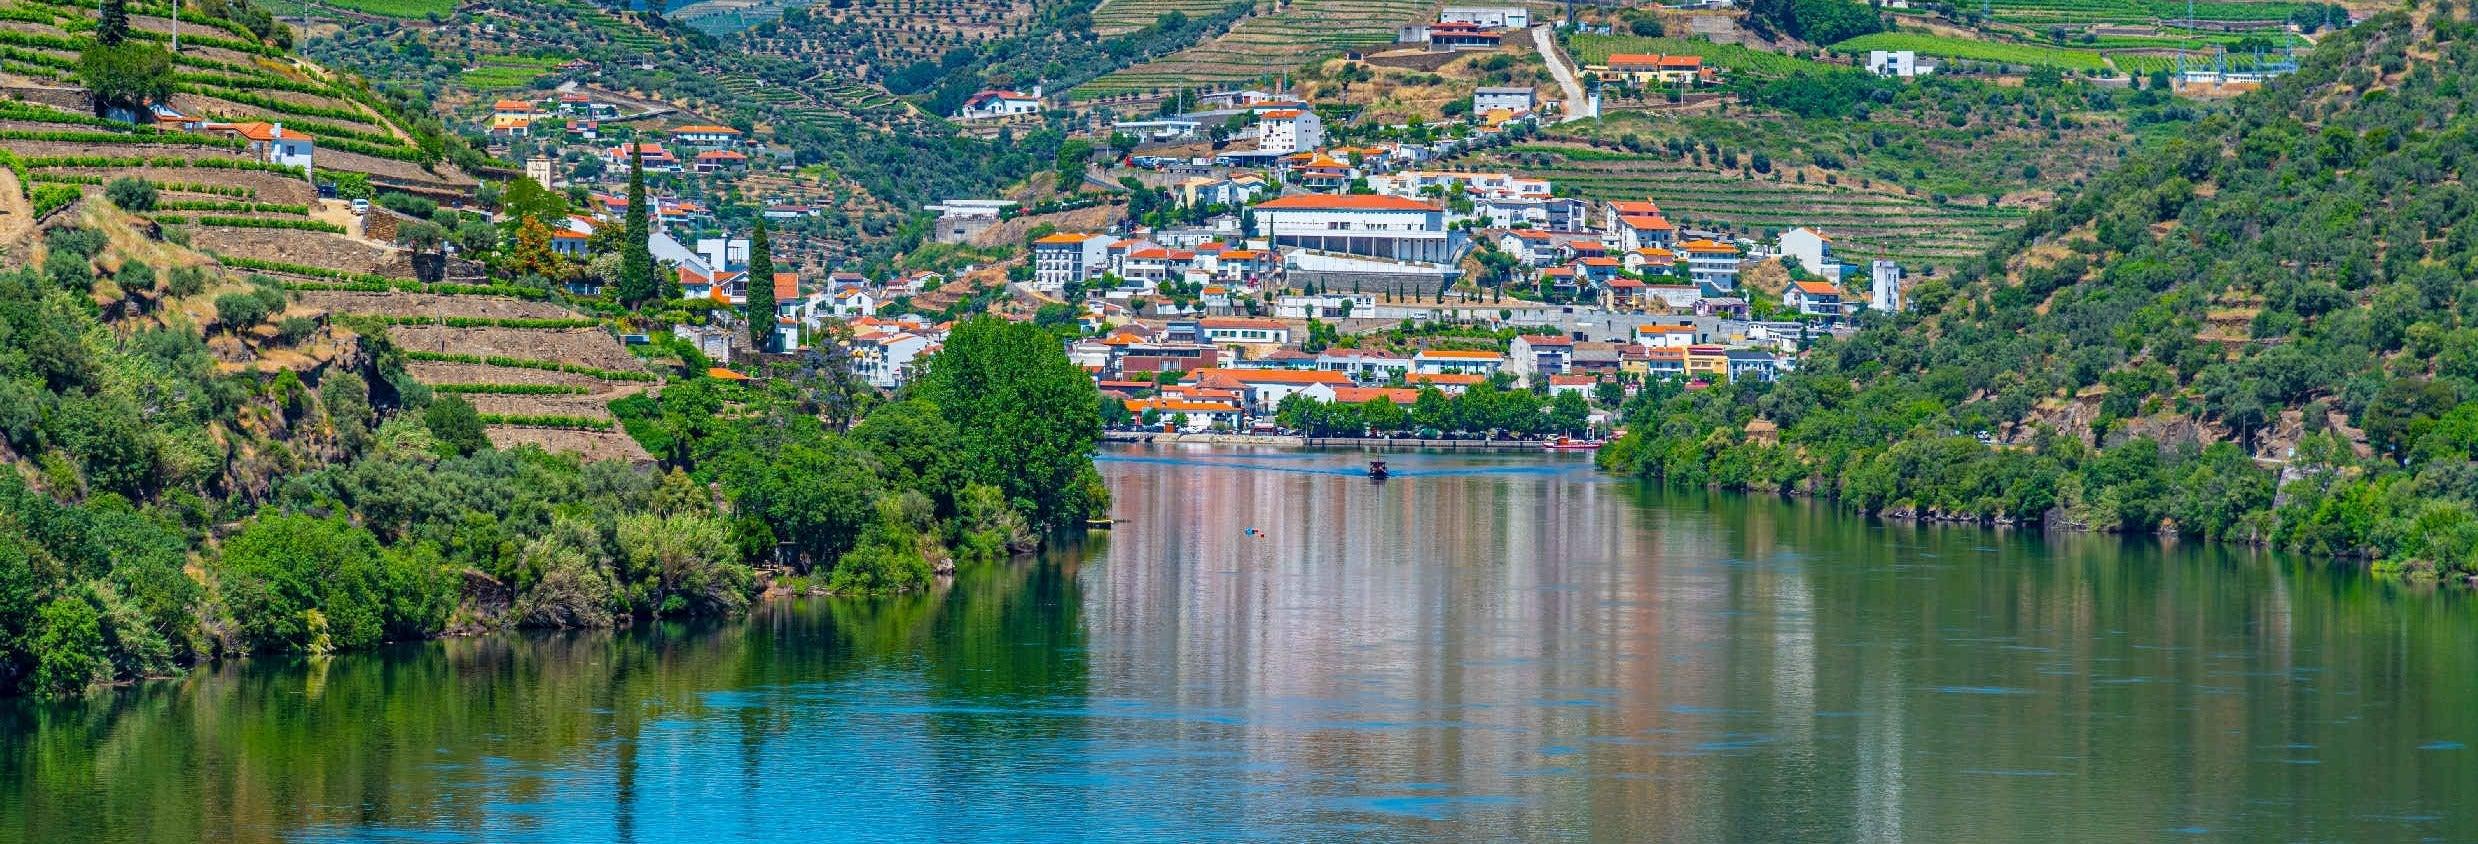 Passeio de barco privado pelo rio Douro